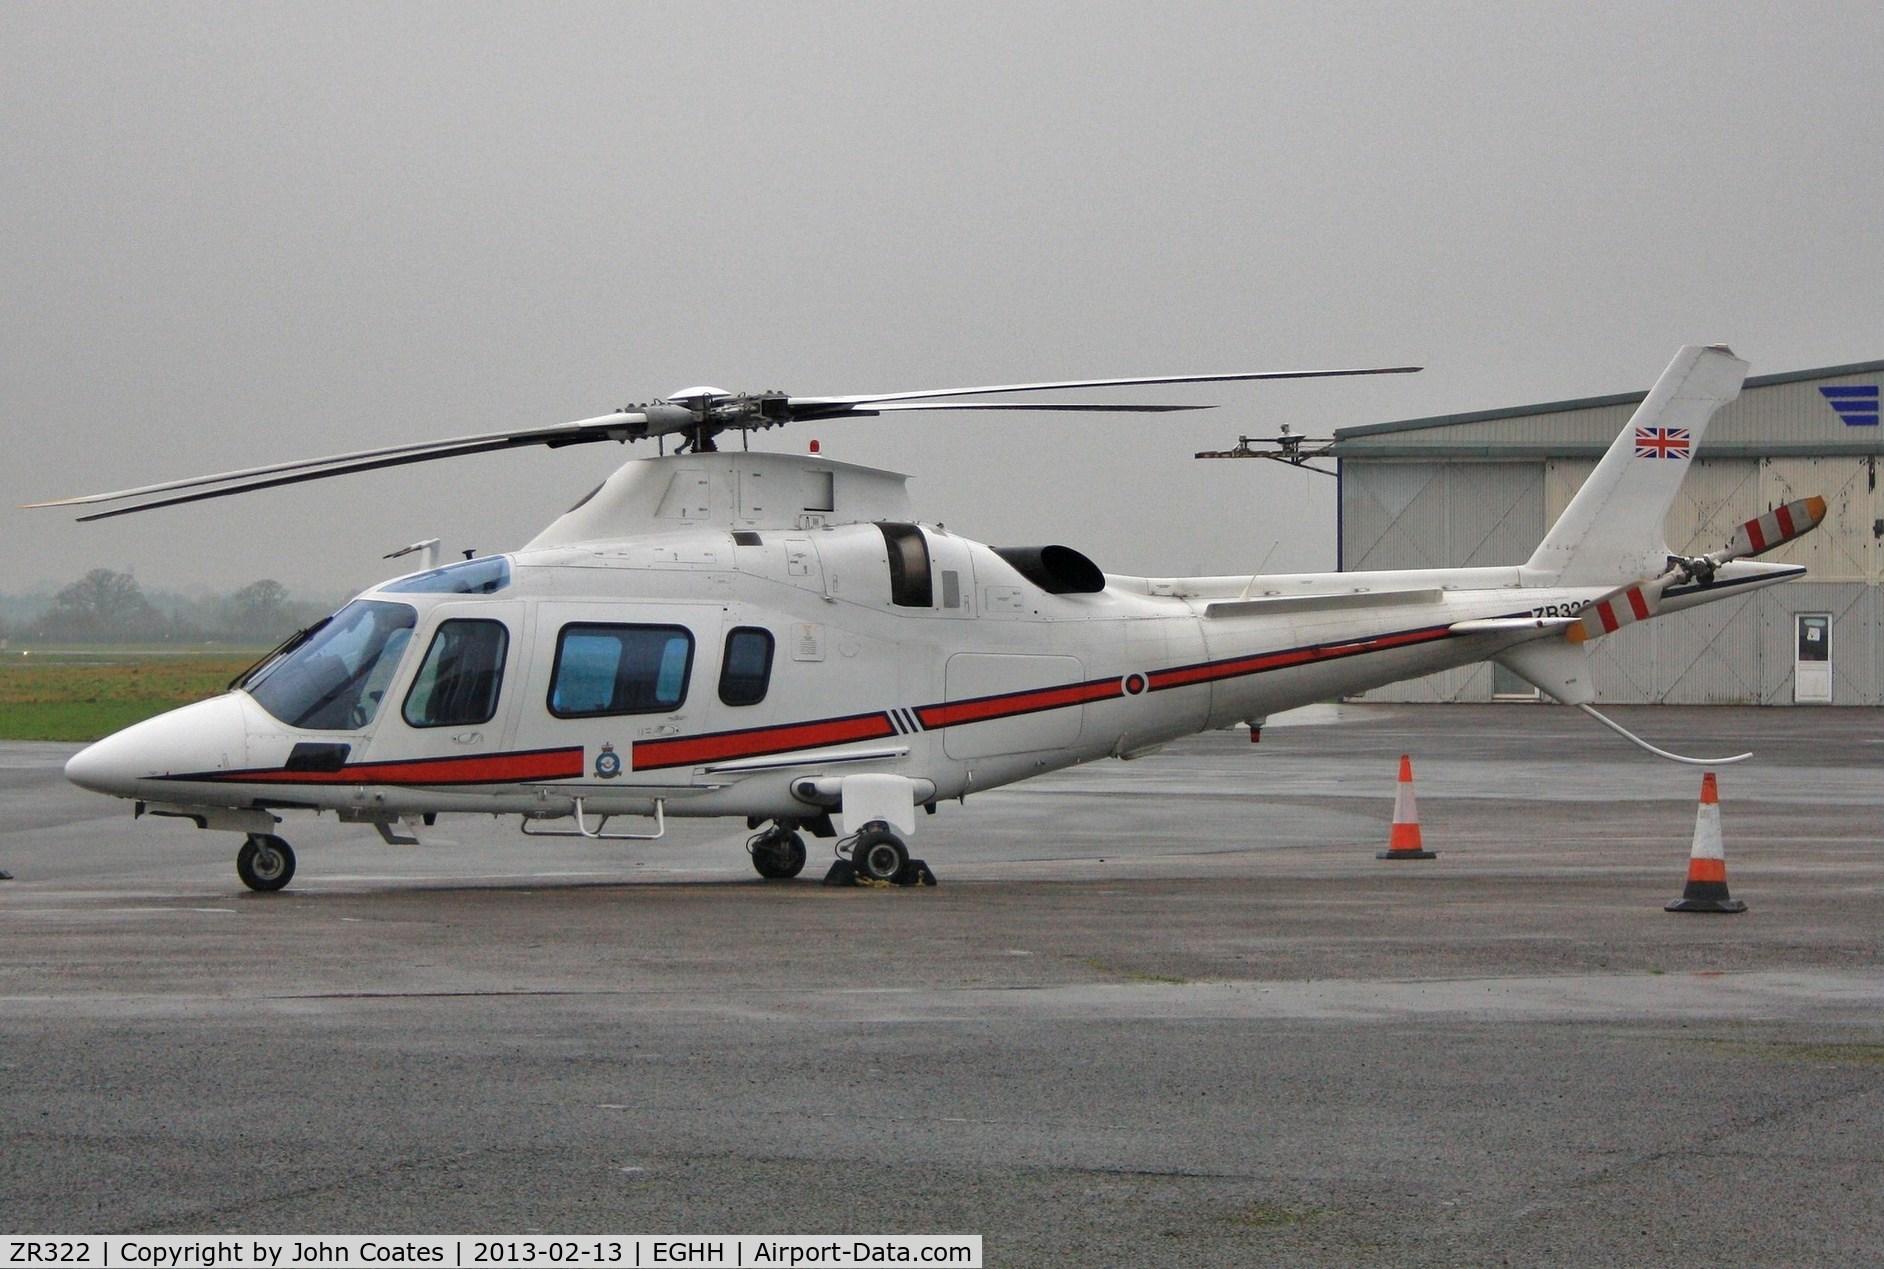 ZR322, 2006 Agusta A-109E Power C/N 11664, Parked at Sigs